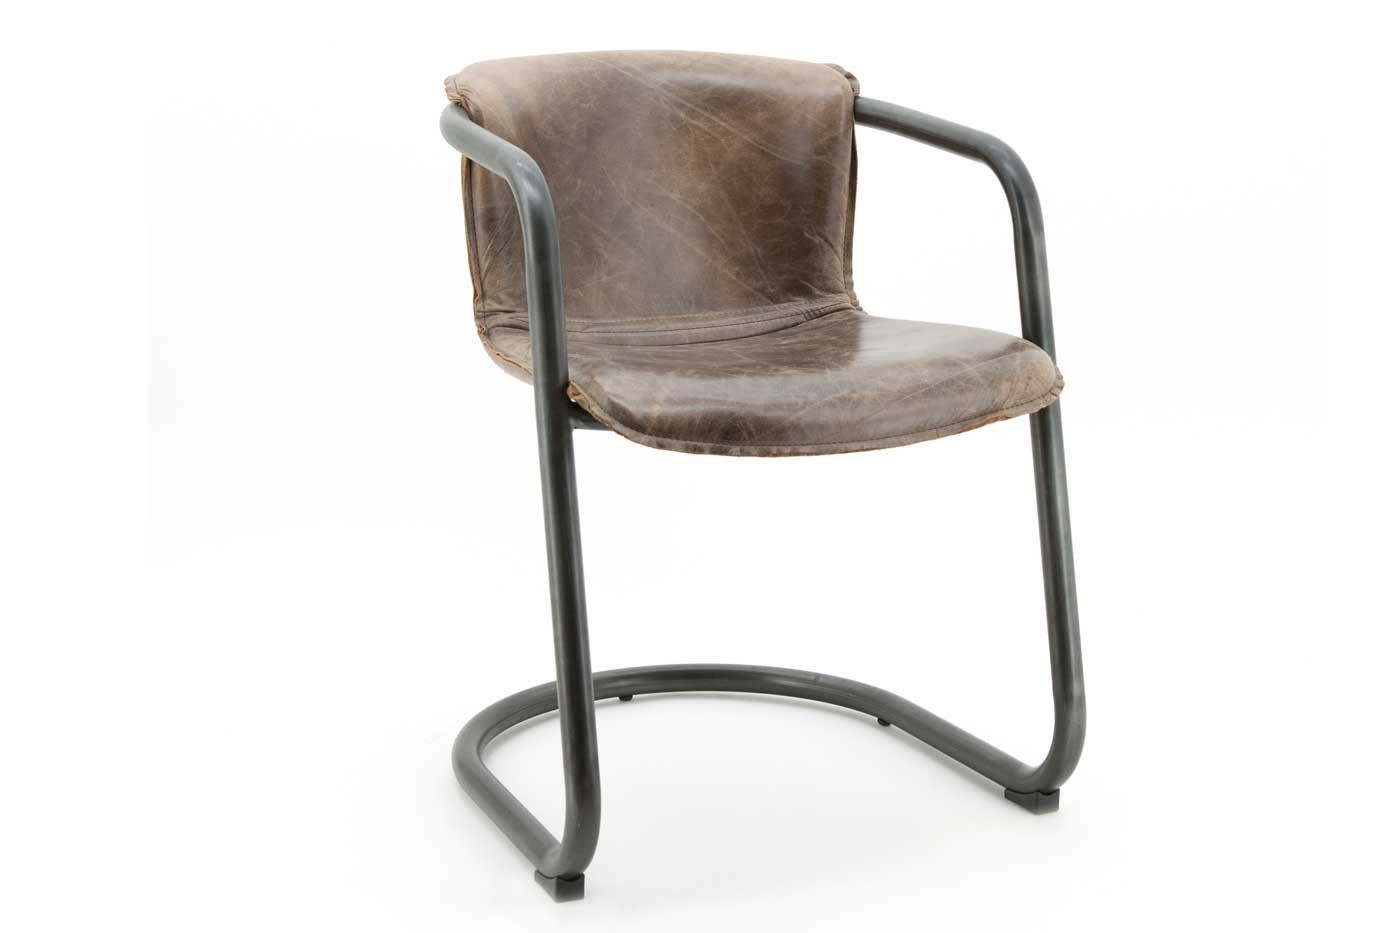 Leder Freischwinger Stuhl Daan Industriedesign Vintage Leder Braun